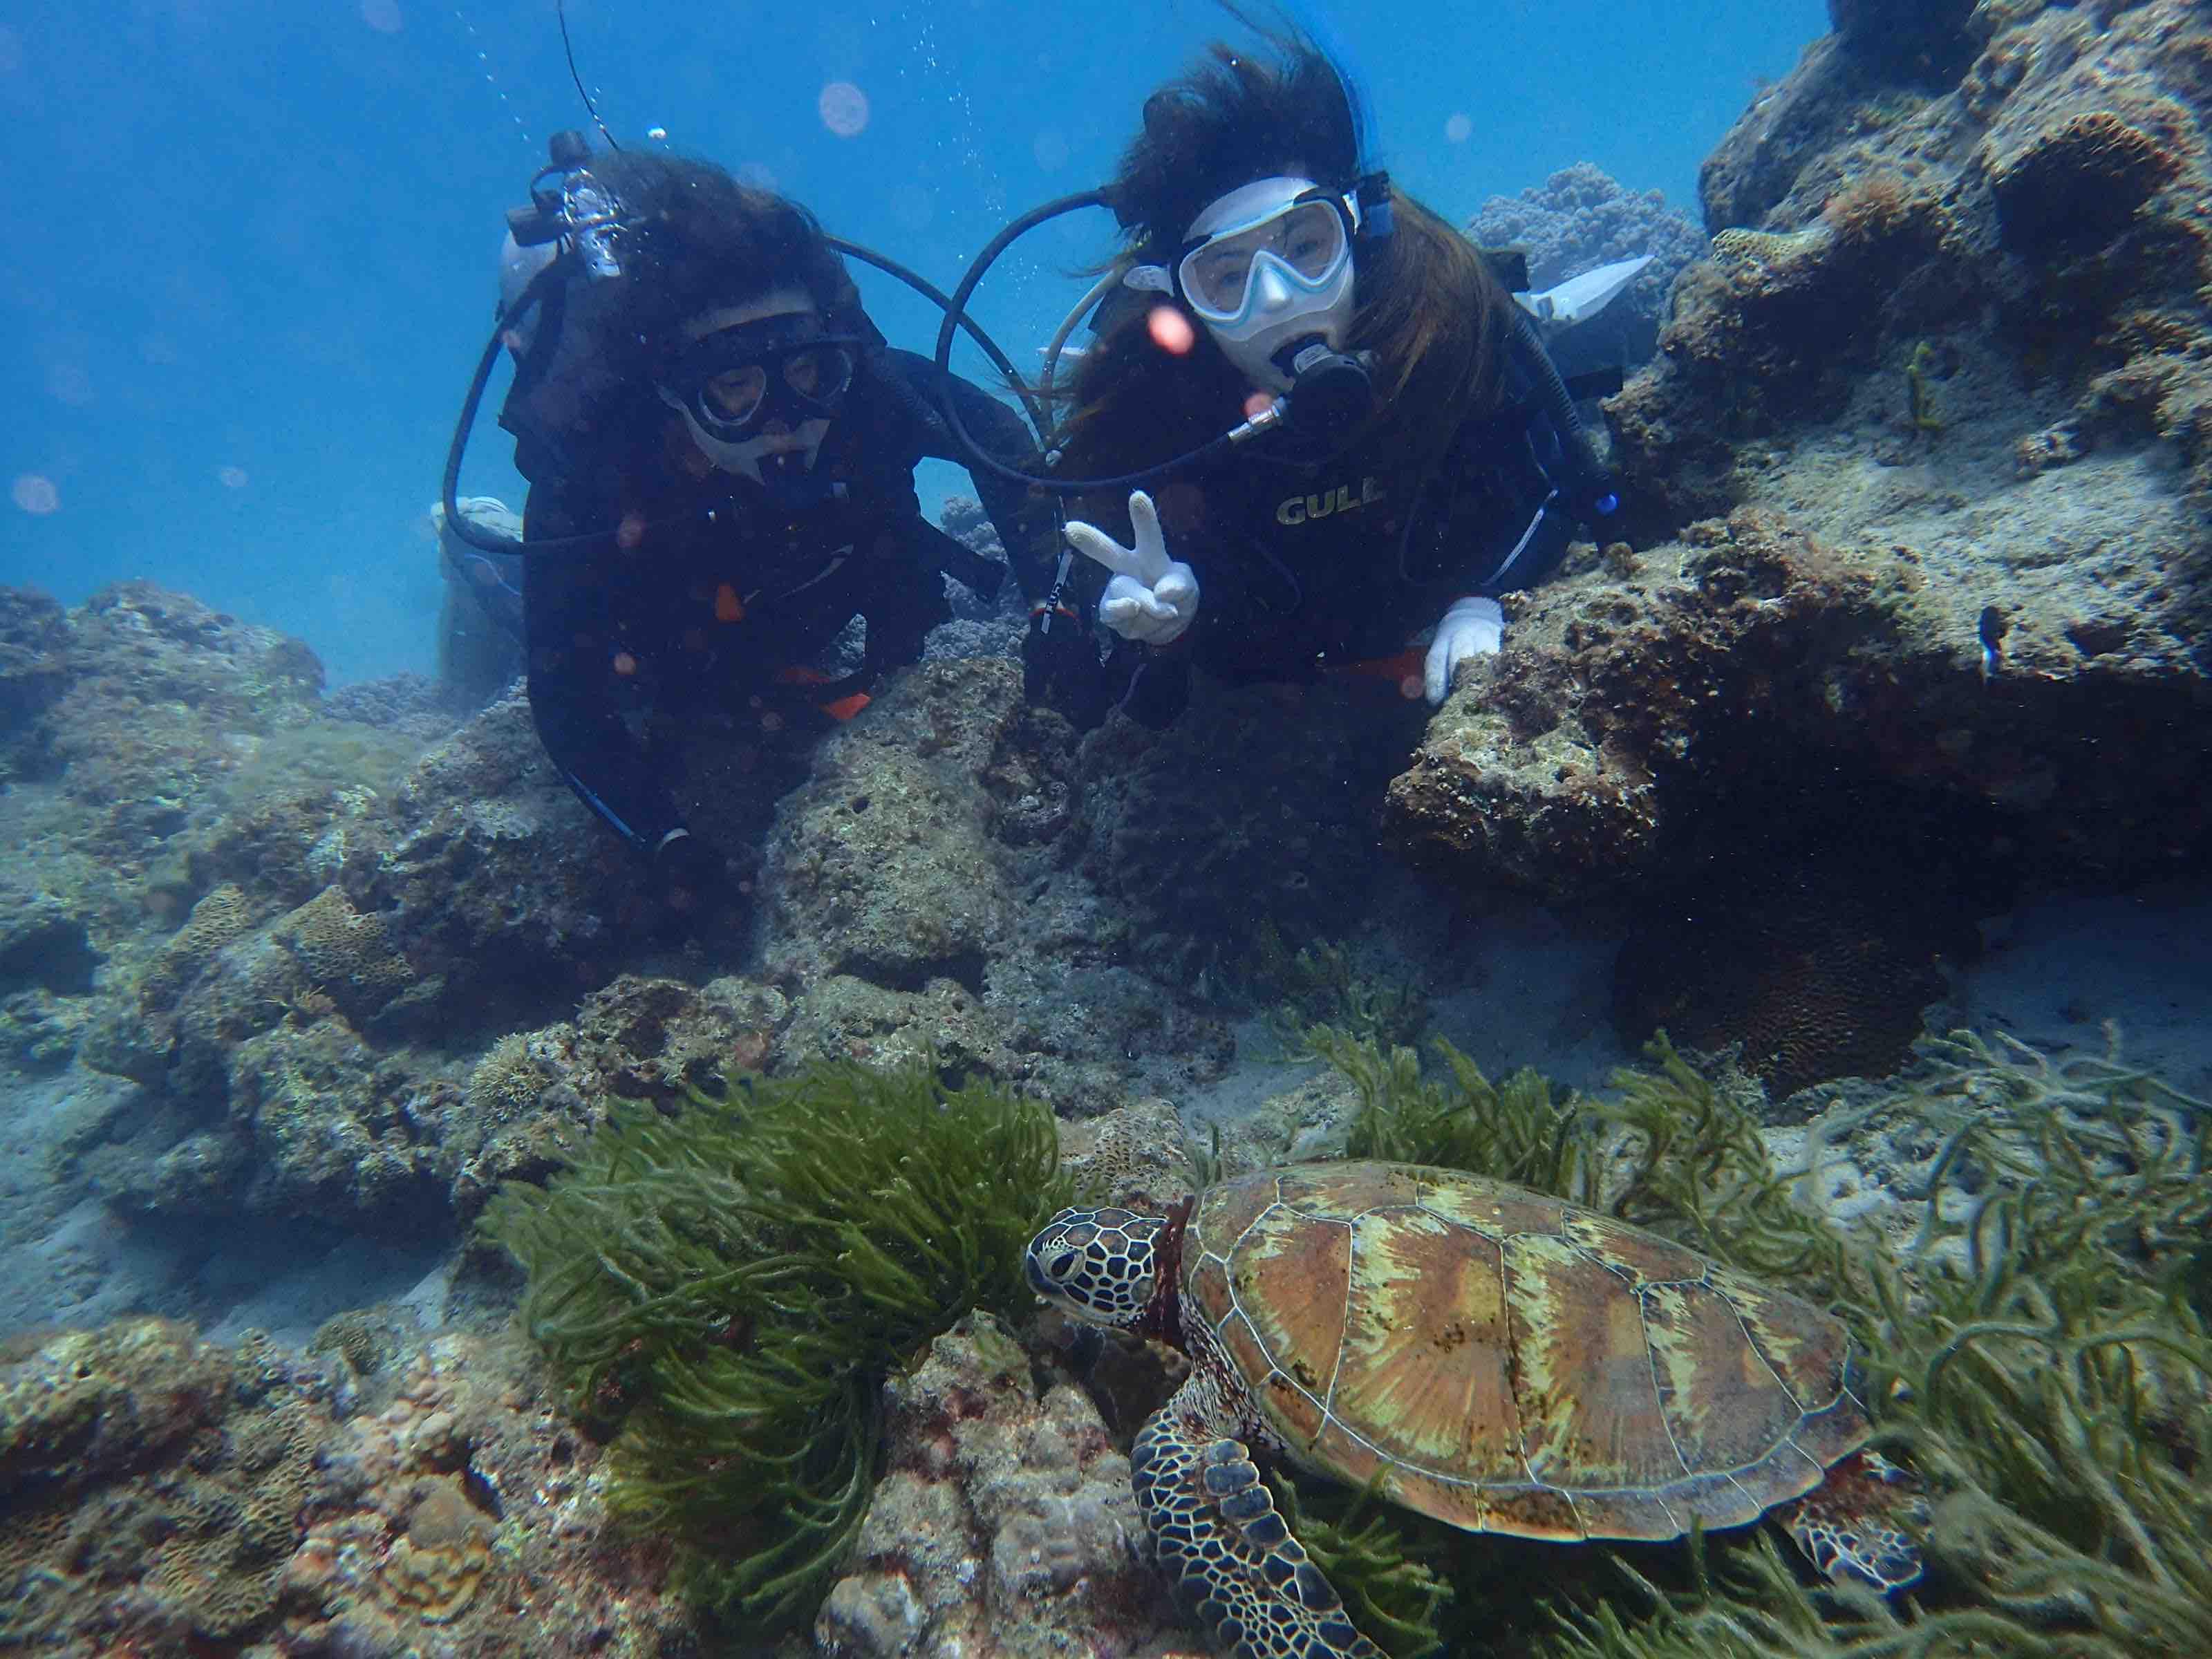 http://www.aquamarine-dive.net/blog/index.html/2017/07/28/P7211043.jpg